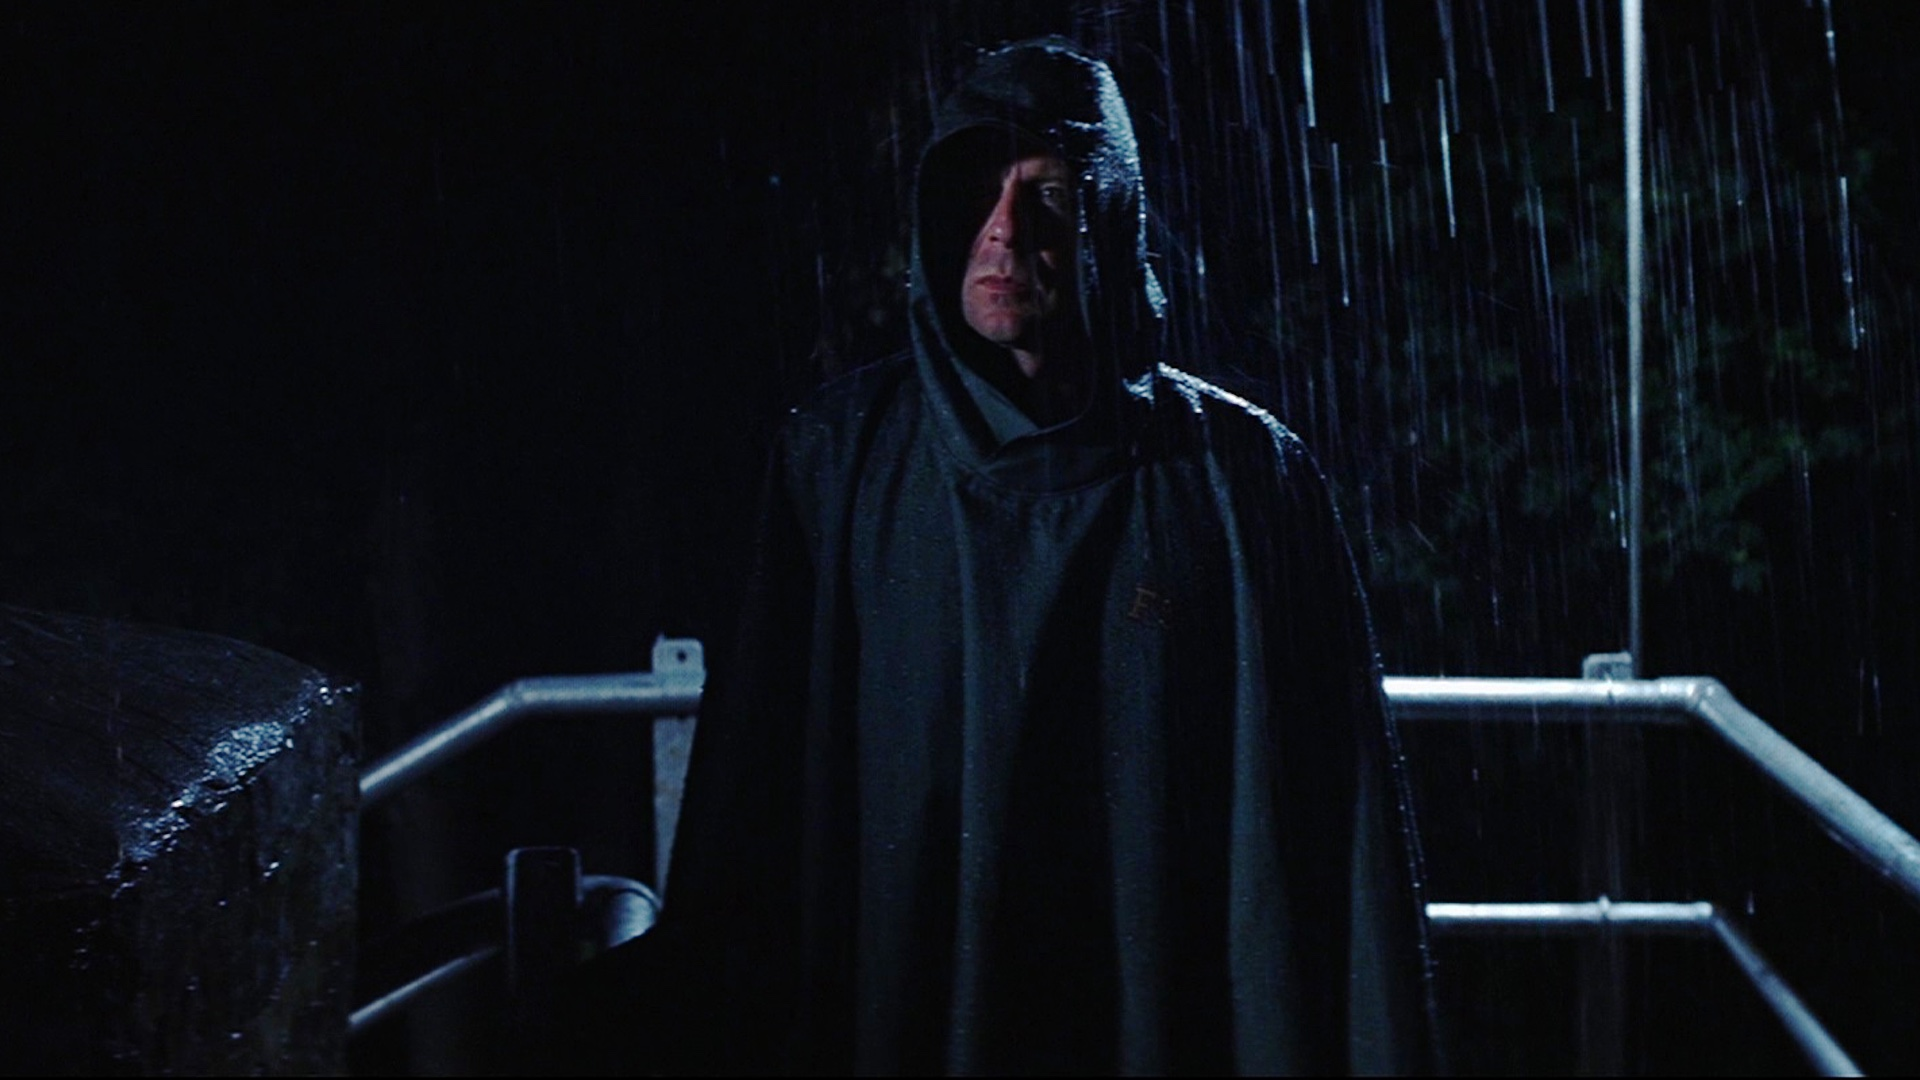 Bruce Willis as David Dunn, M. Night Shyamalan's kitchen sink superhero in Unbreakable (2000)